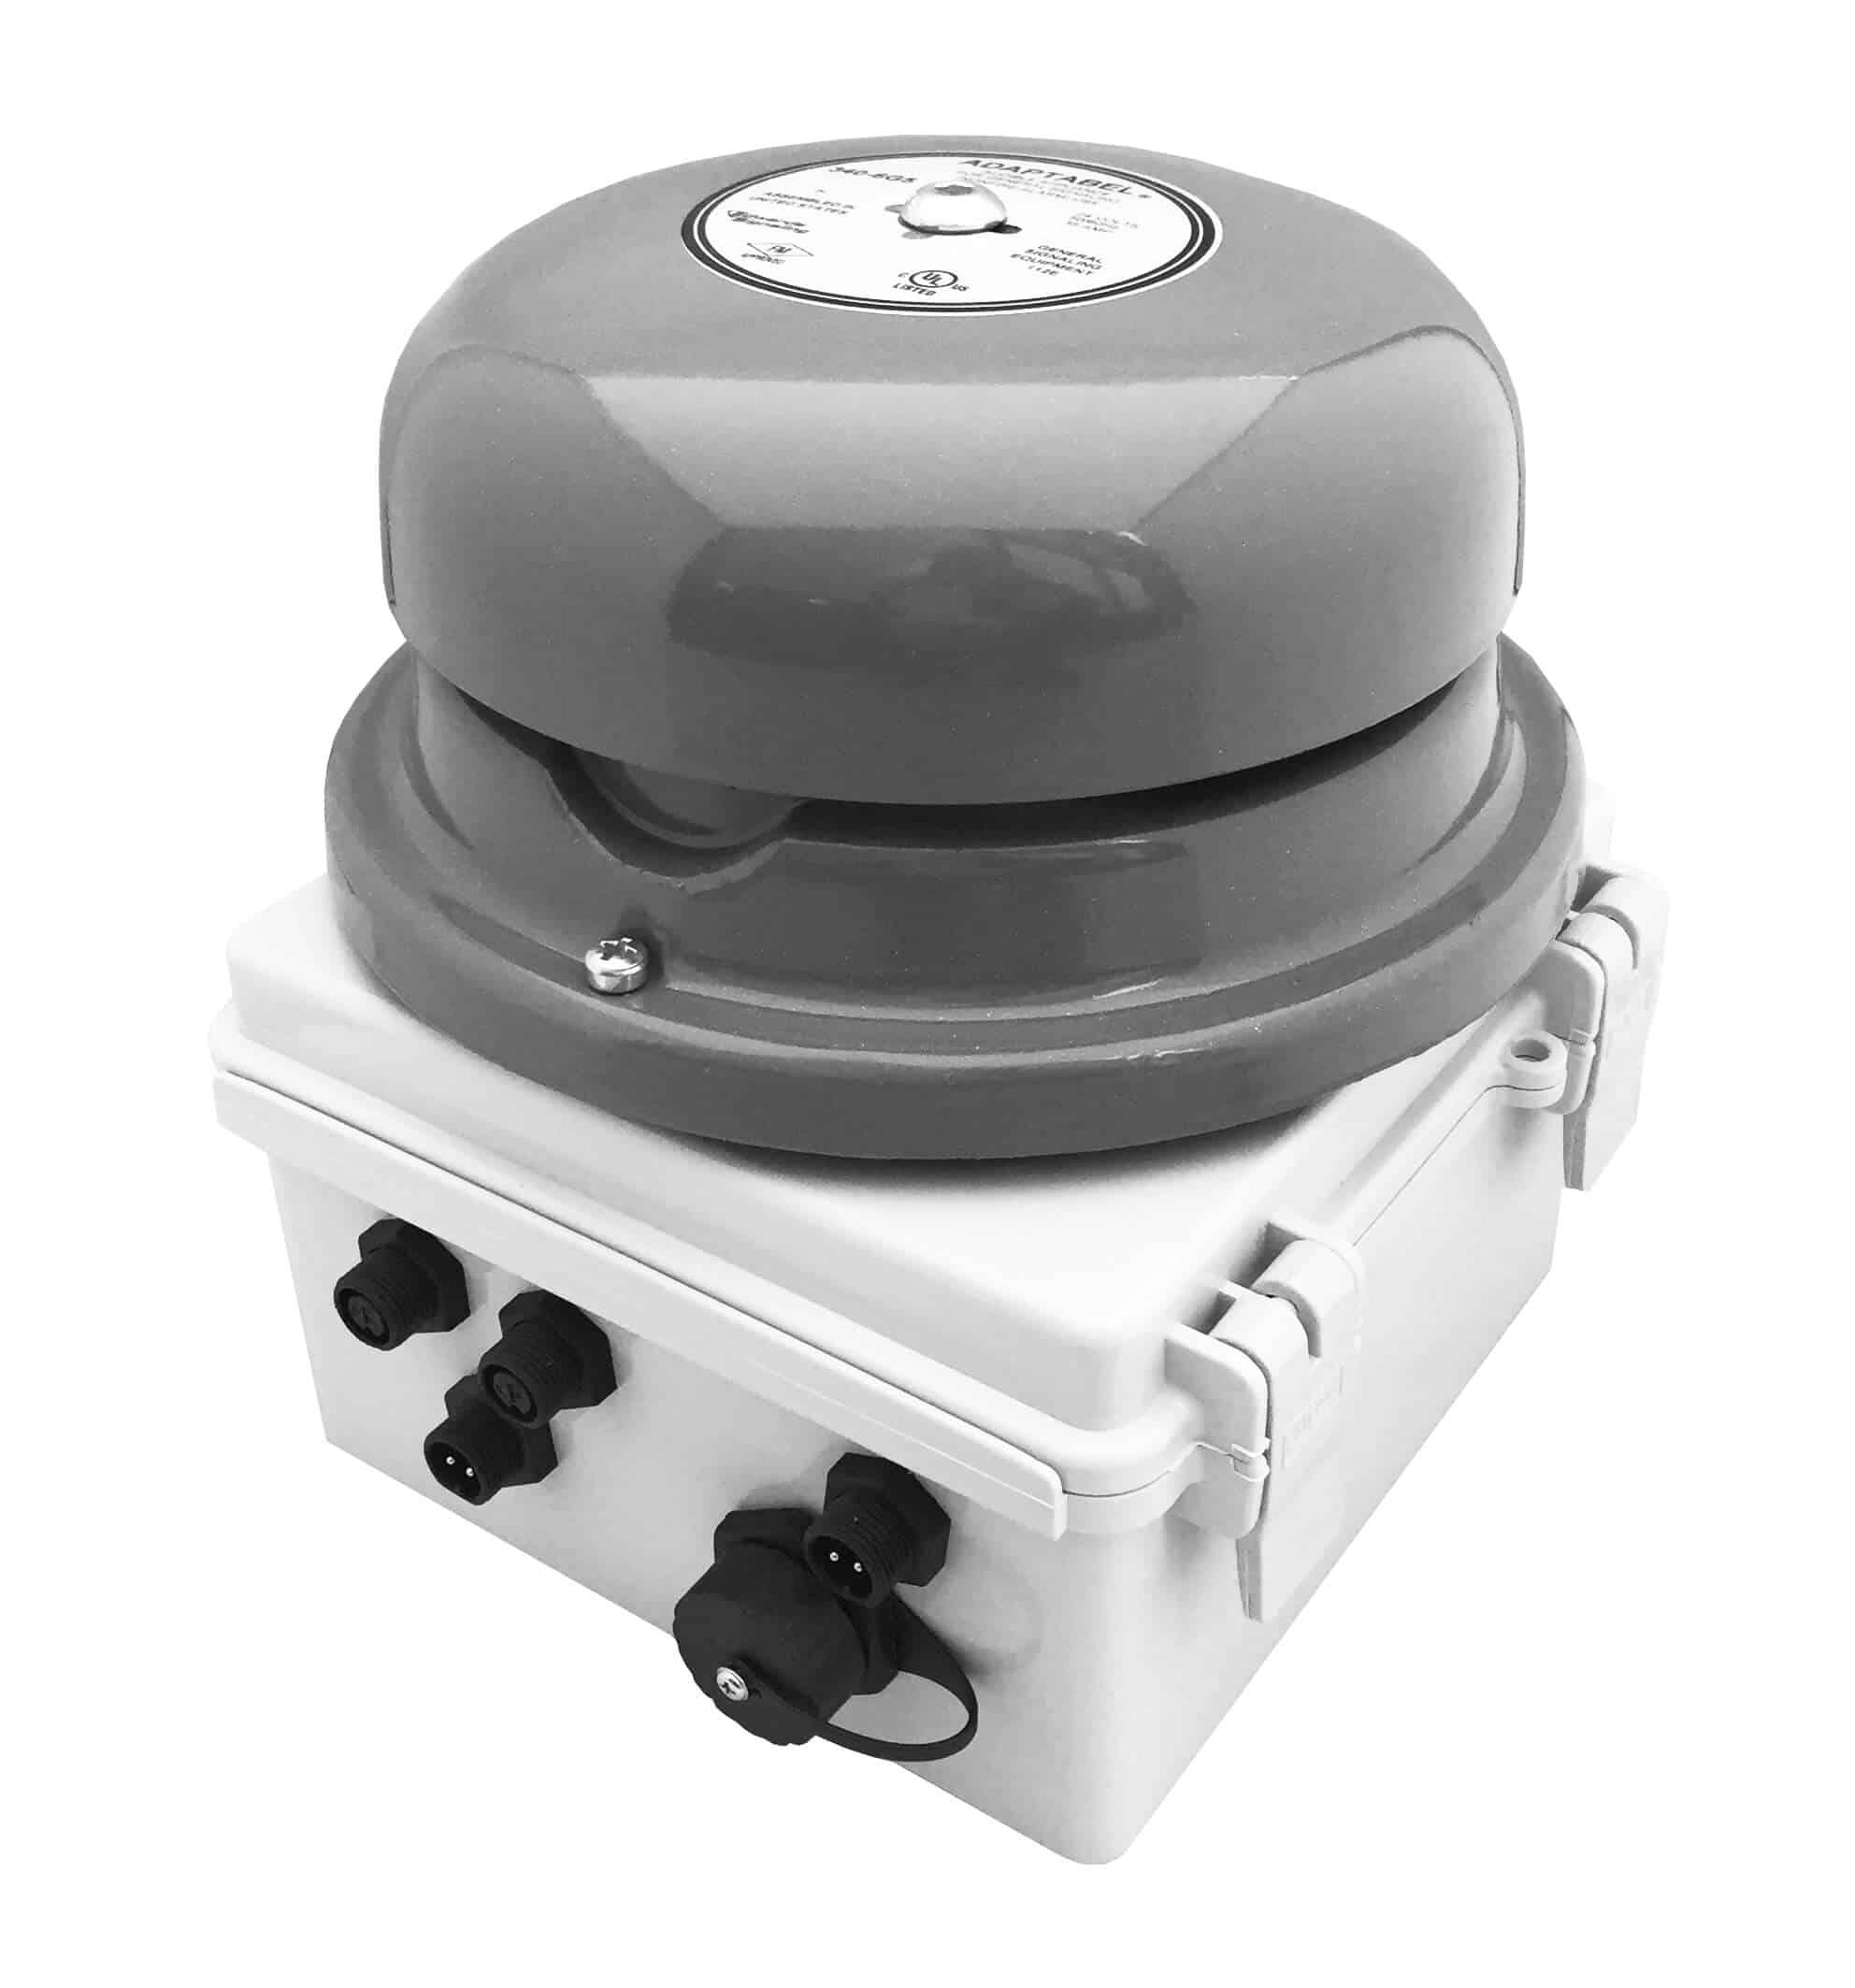 Netbell-KL-M2 Network All-in-One Extra Loud Break Bell System